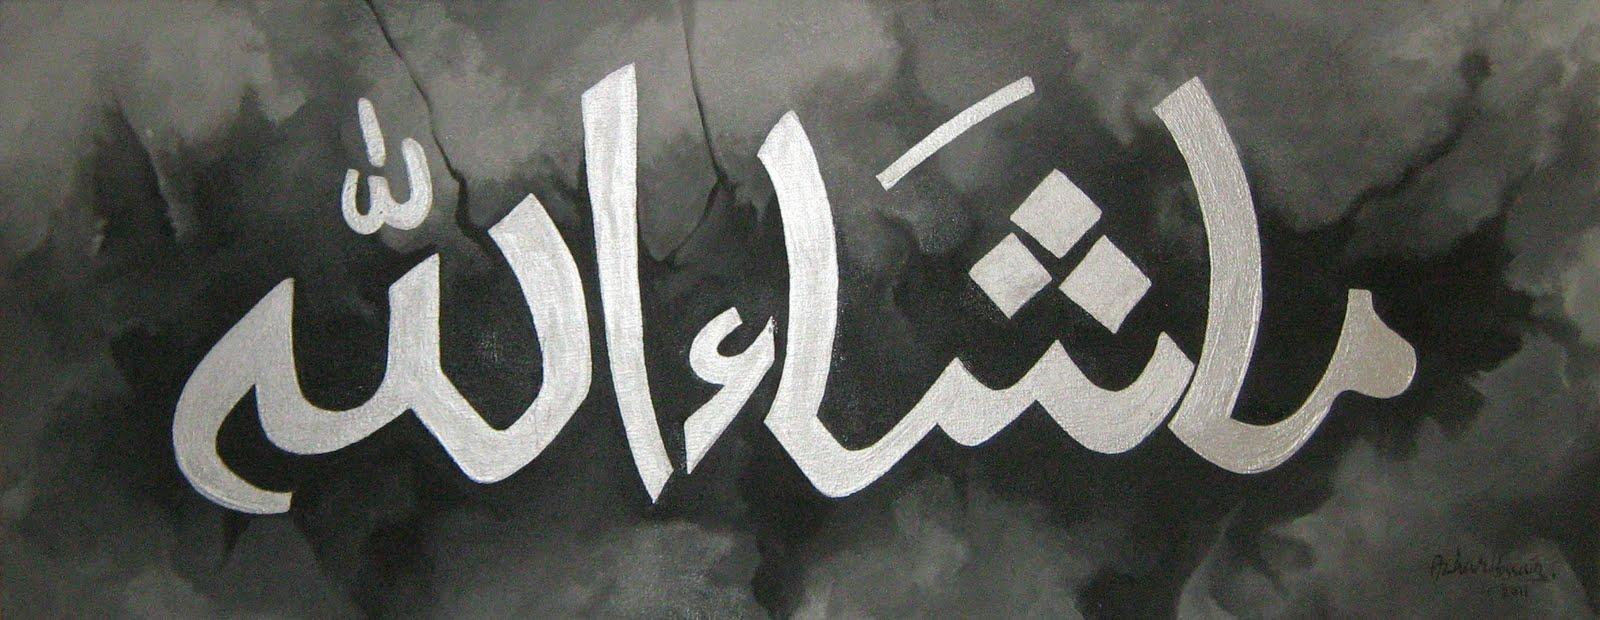 Syed Azhar Masha Allah